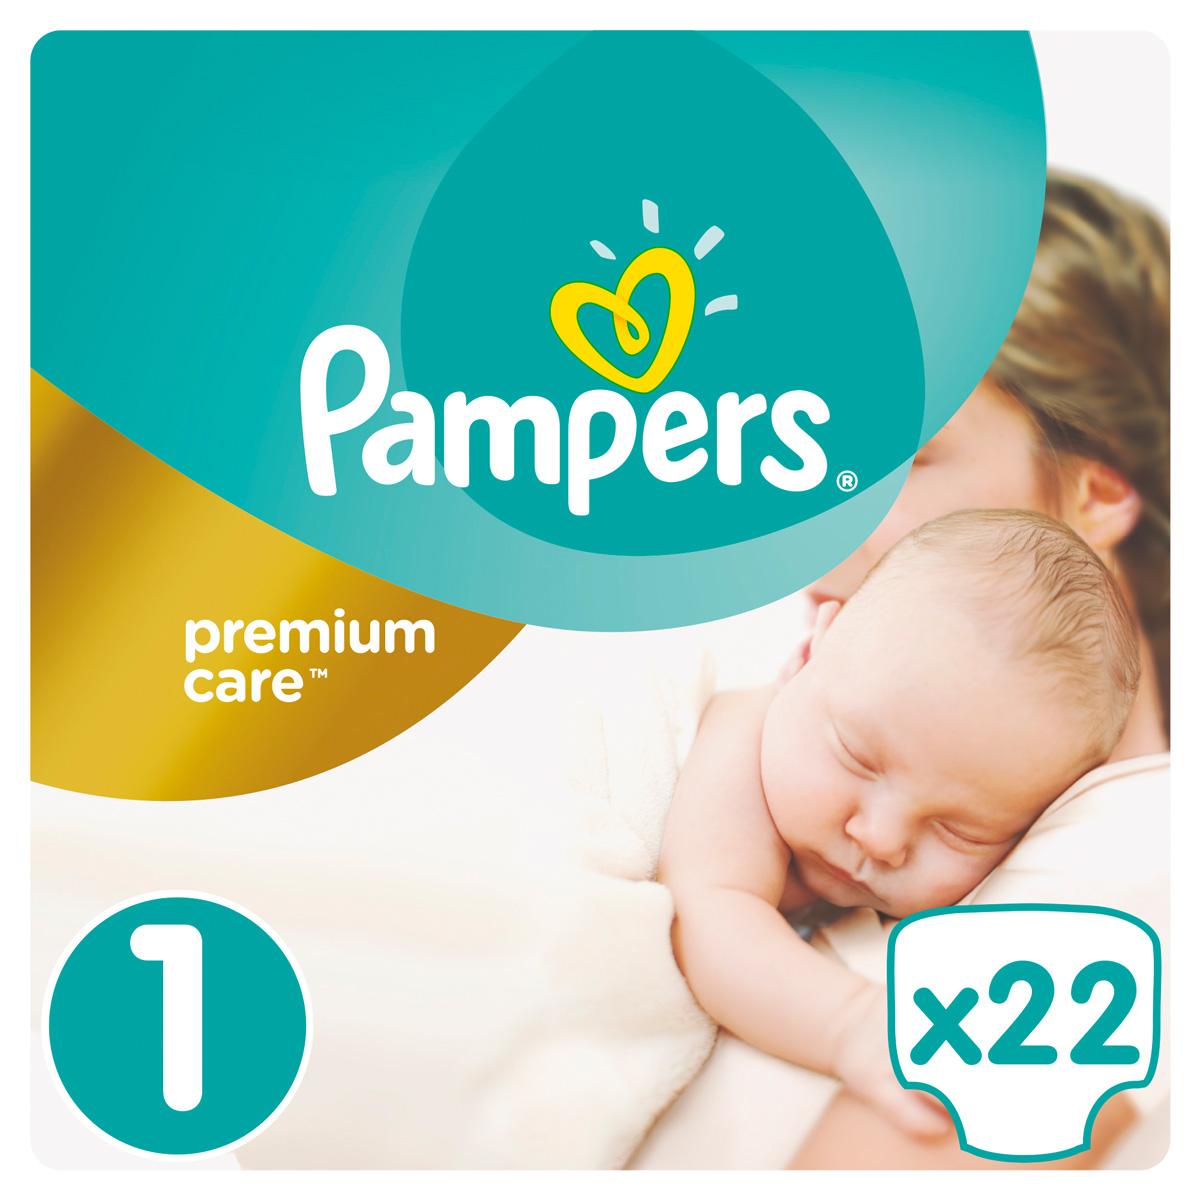 Pampers Подгузники Premium Care 2-5 кг (размер 1) 22 шт подгузники детские pampers подгузники pampers premium care 3 6 кг 96 шт